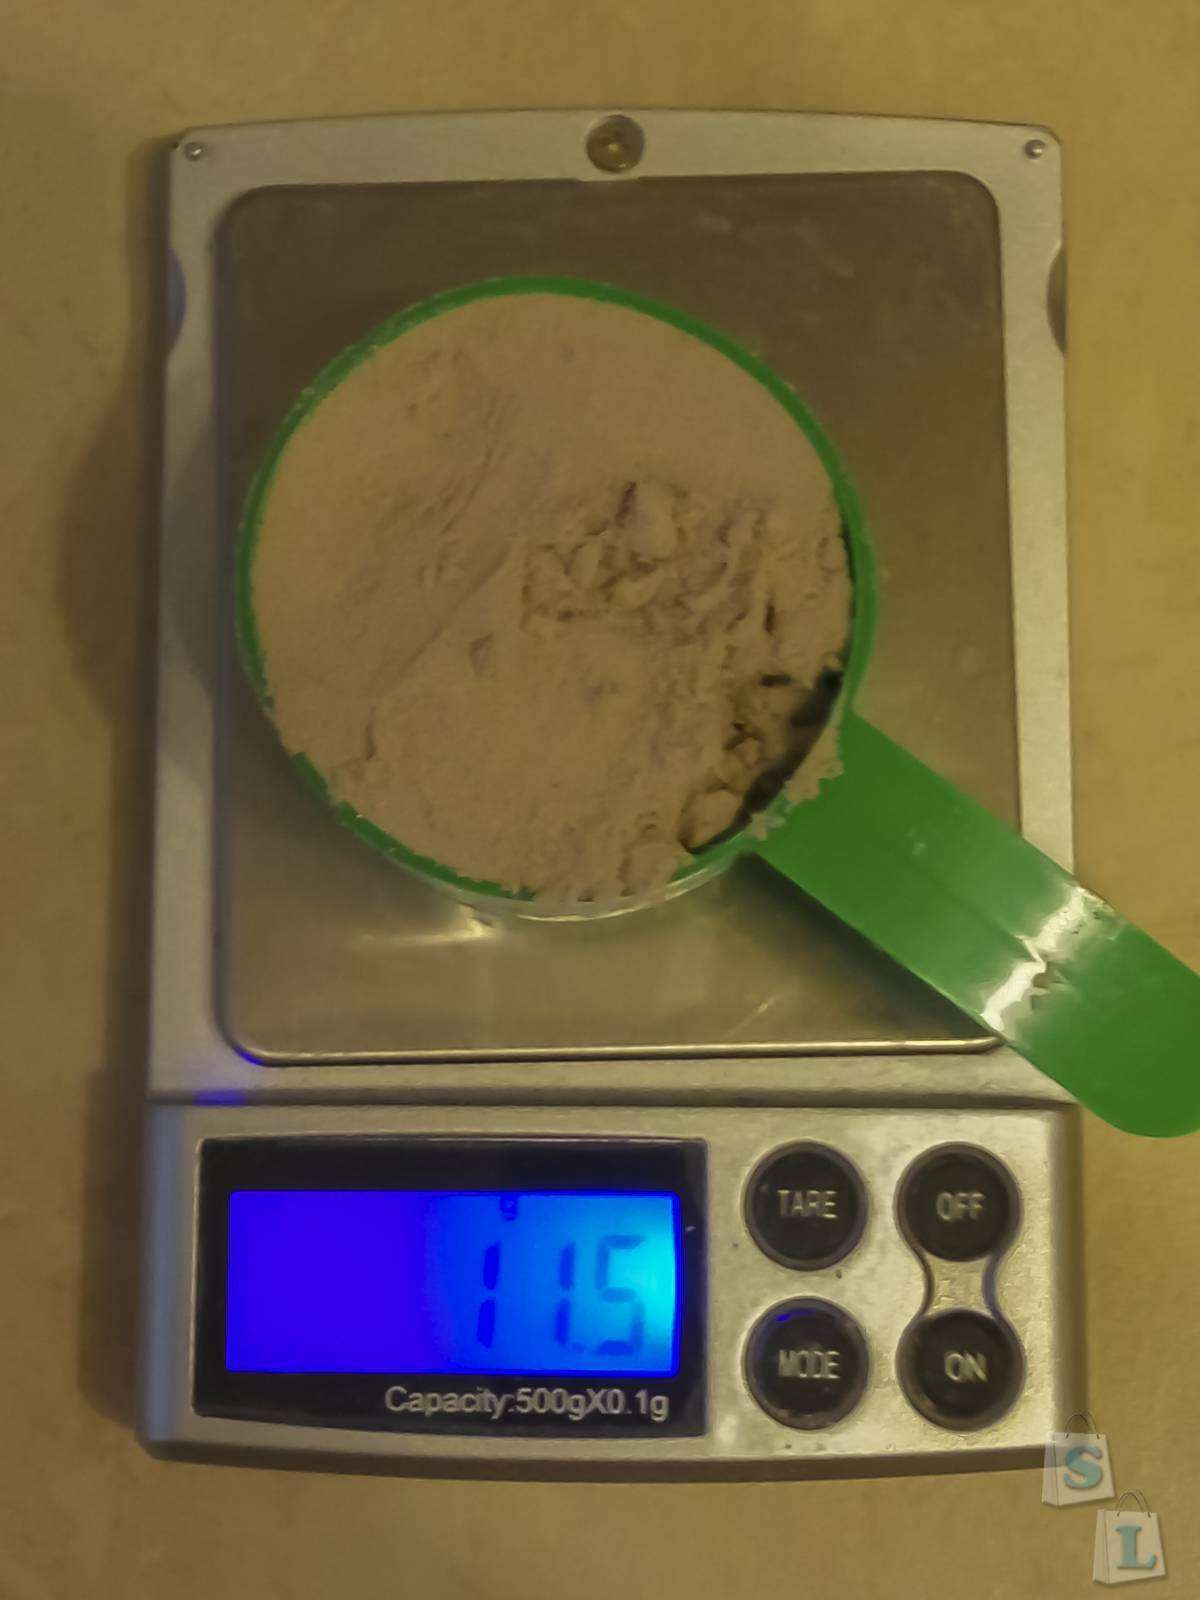 Proteininkiev: Свеженький шоколадный протеин Гадяч, КСБ-70